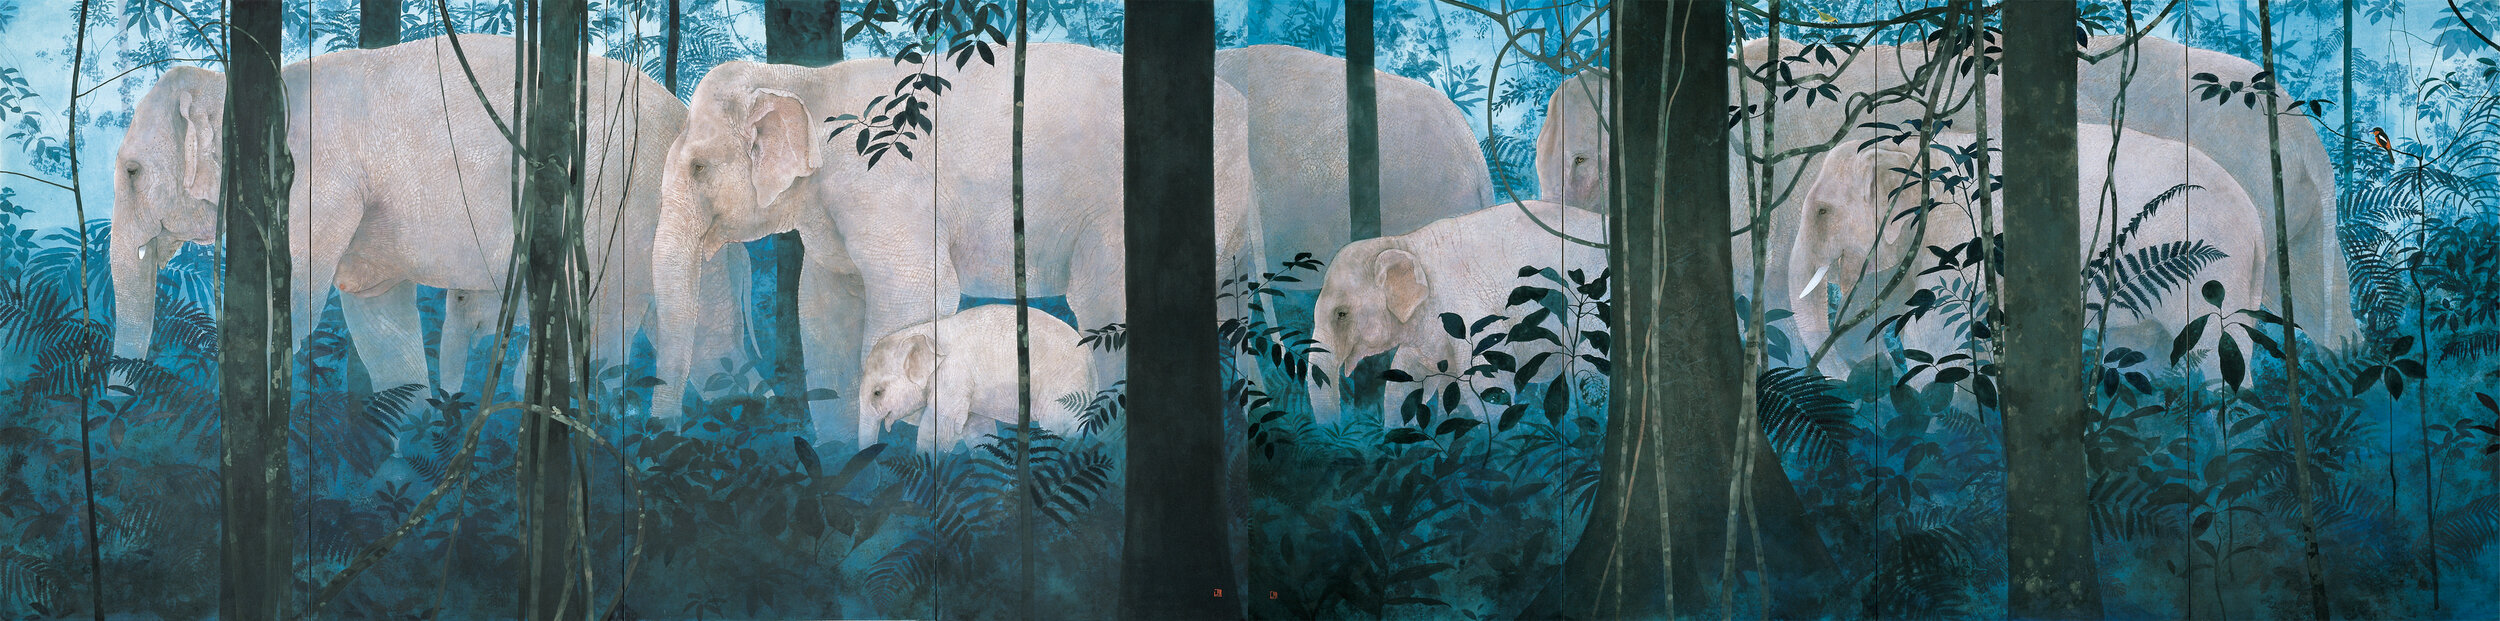 Yoichi Nishino 'Family in the Forest' 2006